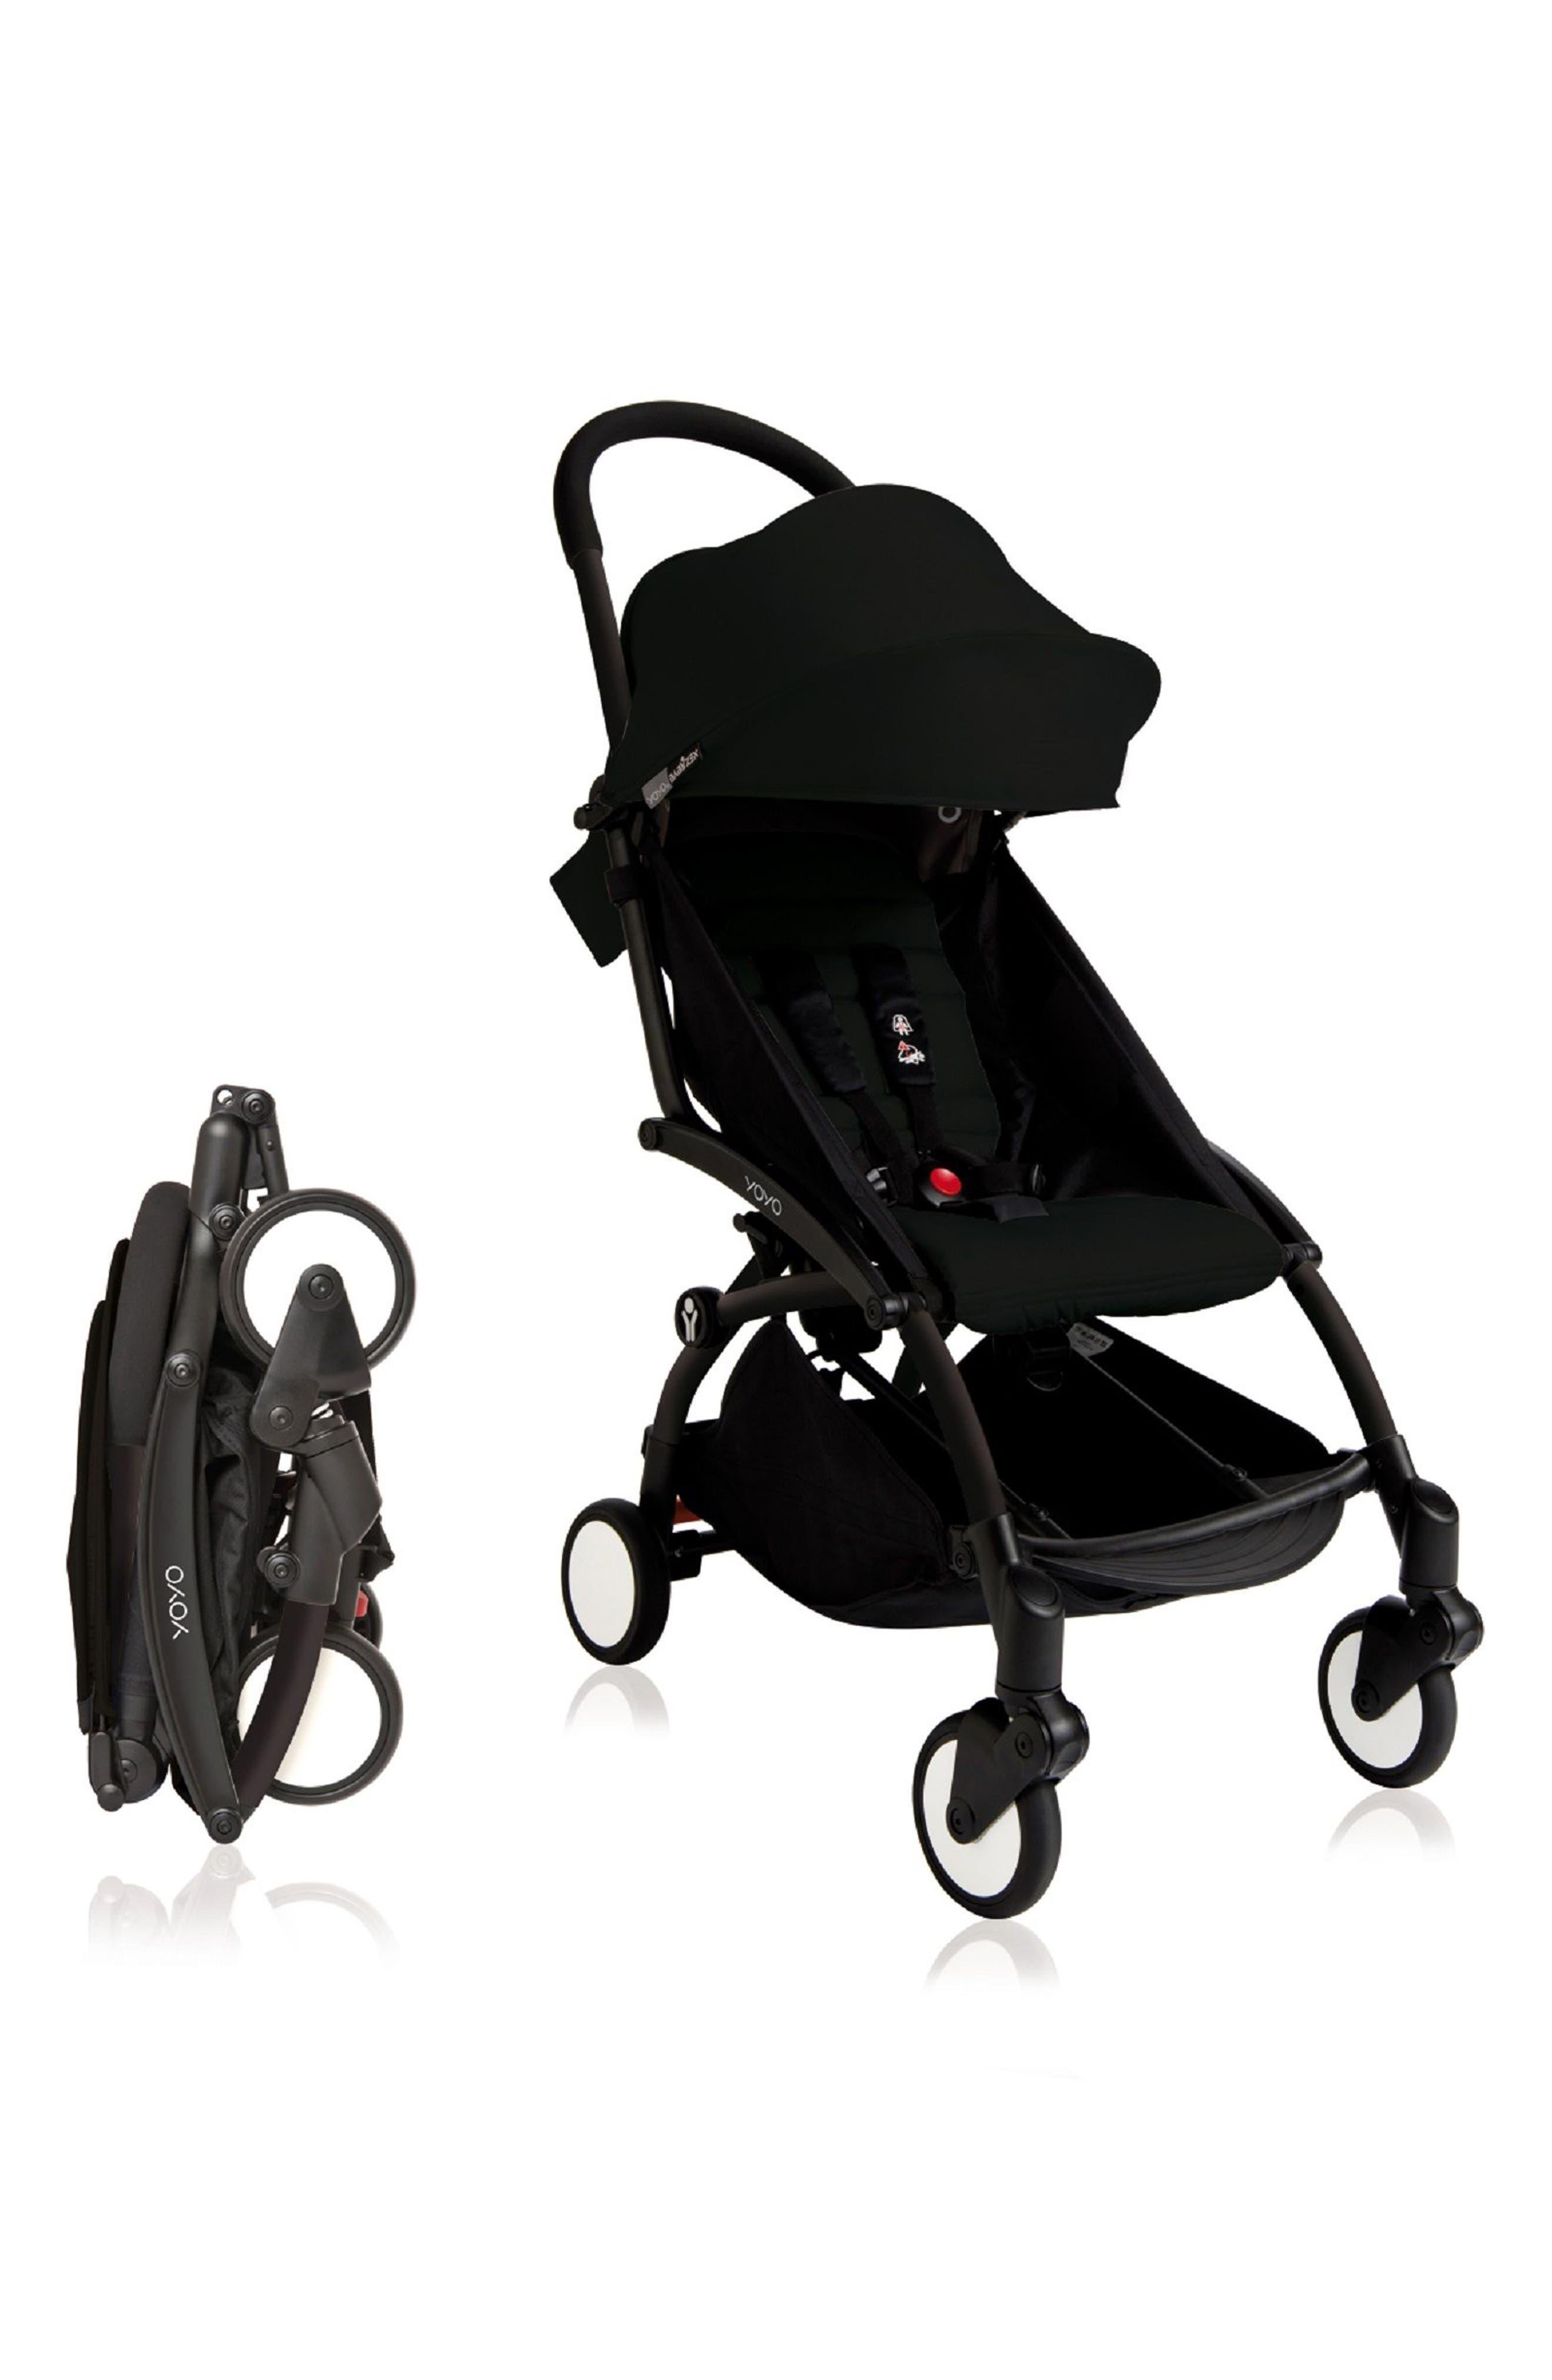 BABYZEN YOYO+ Complete Stroller with Toddler/Little Kid Color Pack Fabric Set,                         Main,                         color, BLACK/ BLACK